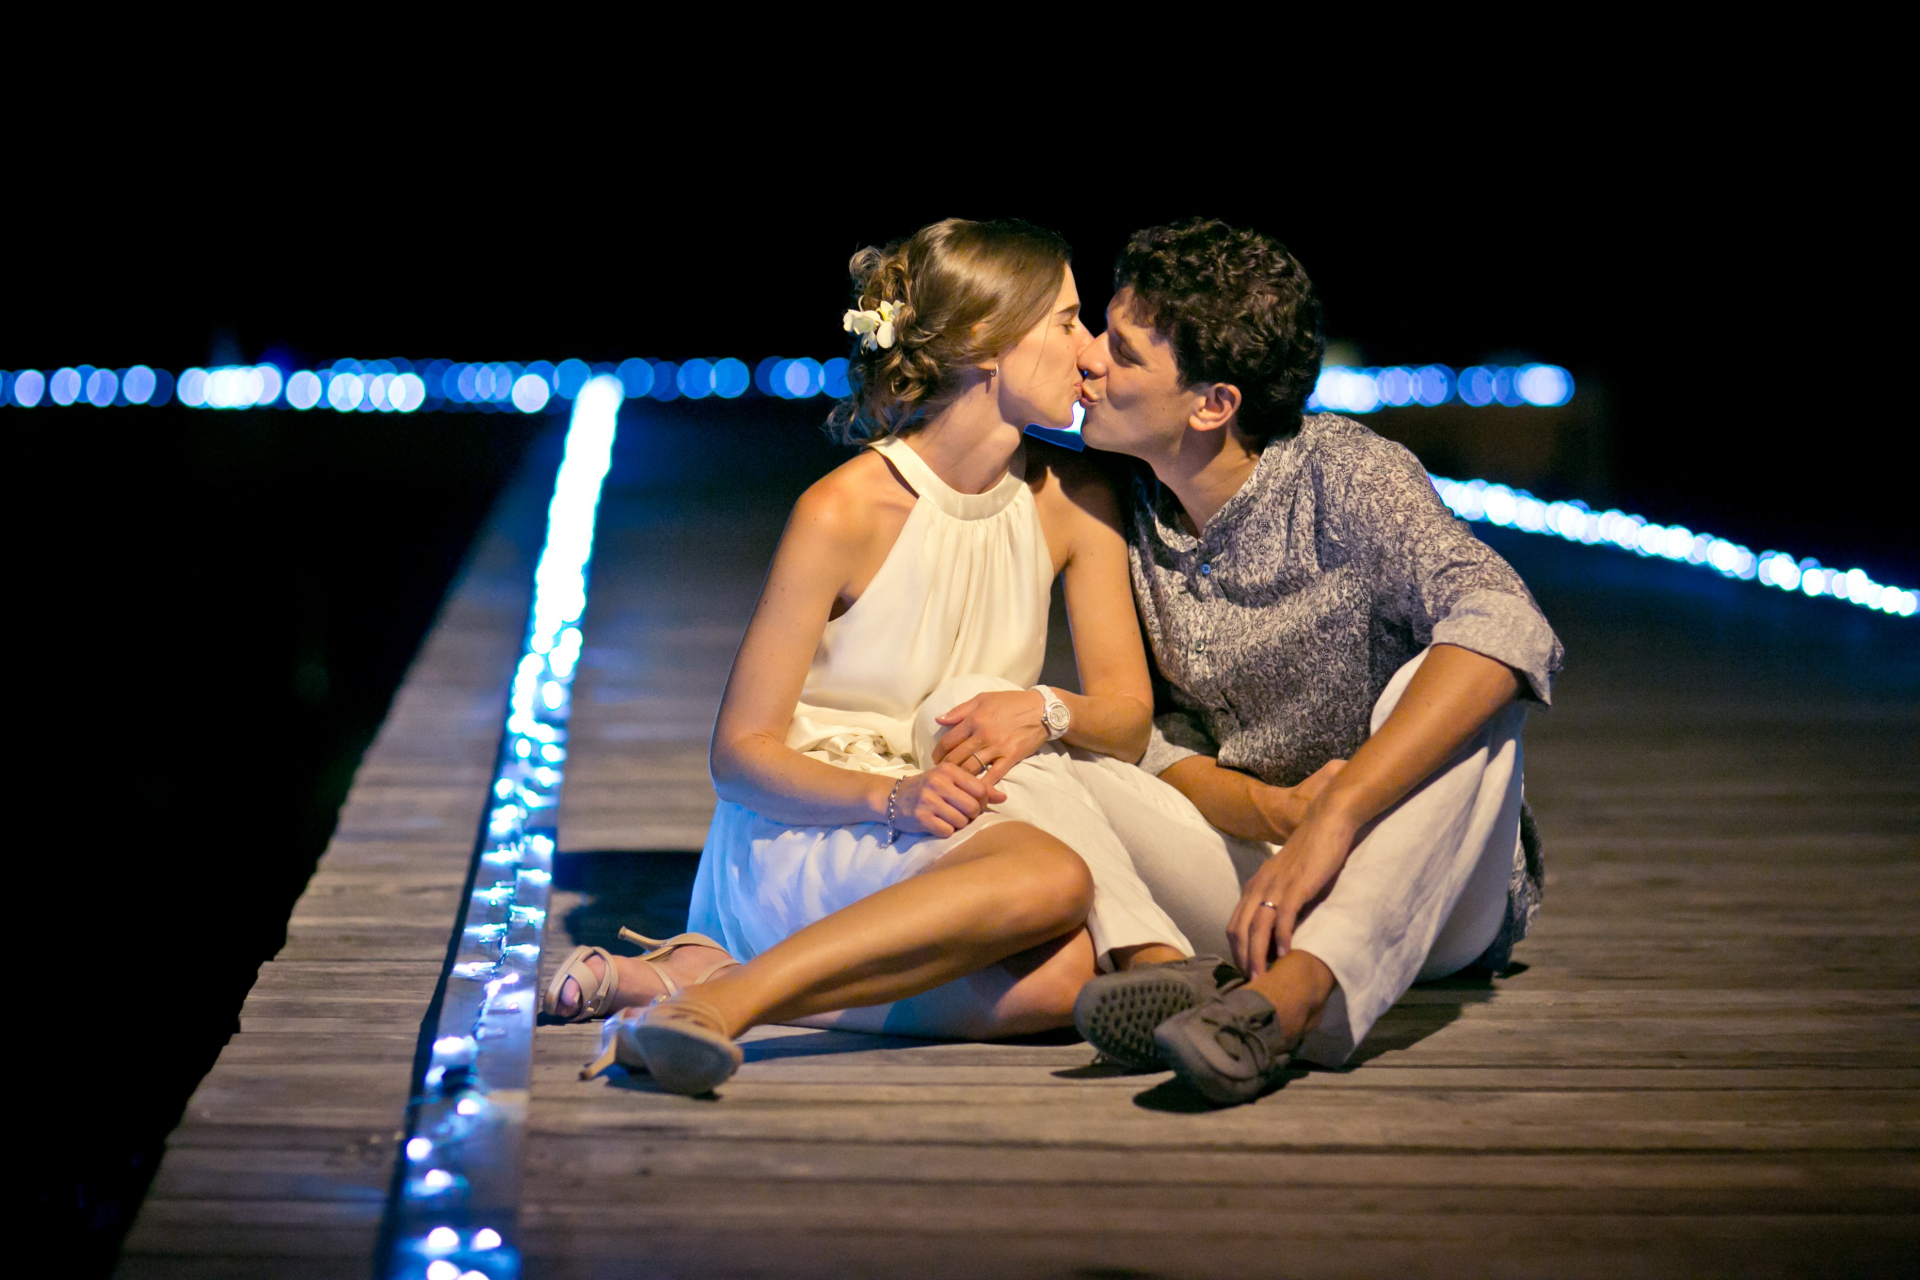 Batu Batu Island, Malaysia Elopement Couple Portrait   The young couple lean in for a kiss